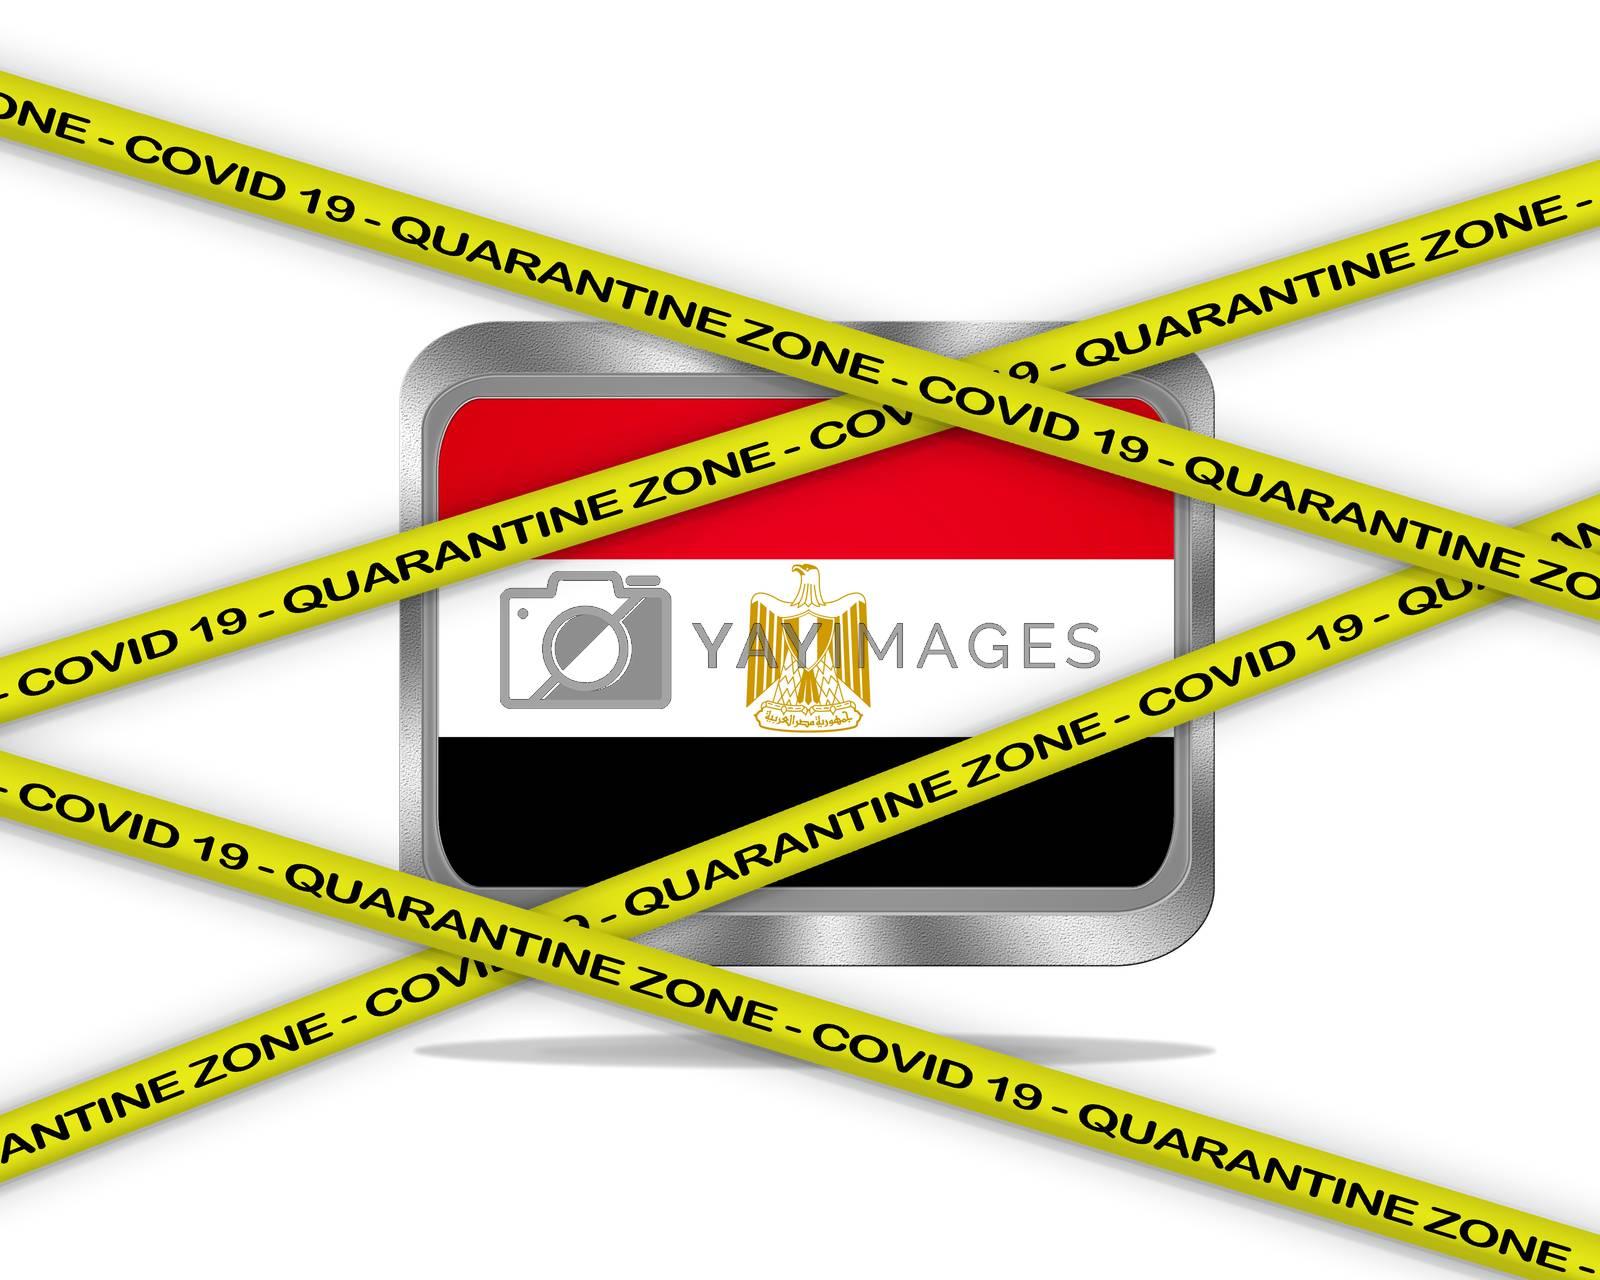 COVID-19 warning yellow ribbon written with: Quarantine zone Cover 19 on Egypt flag illustration. Coronavirus danger area, quarantined country.